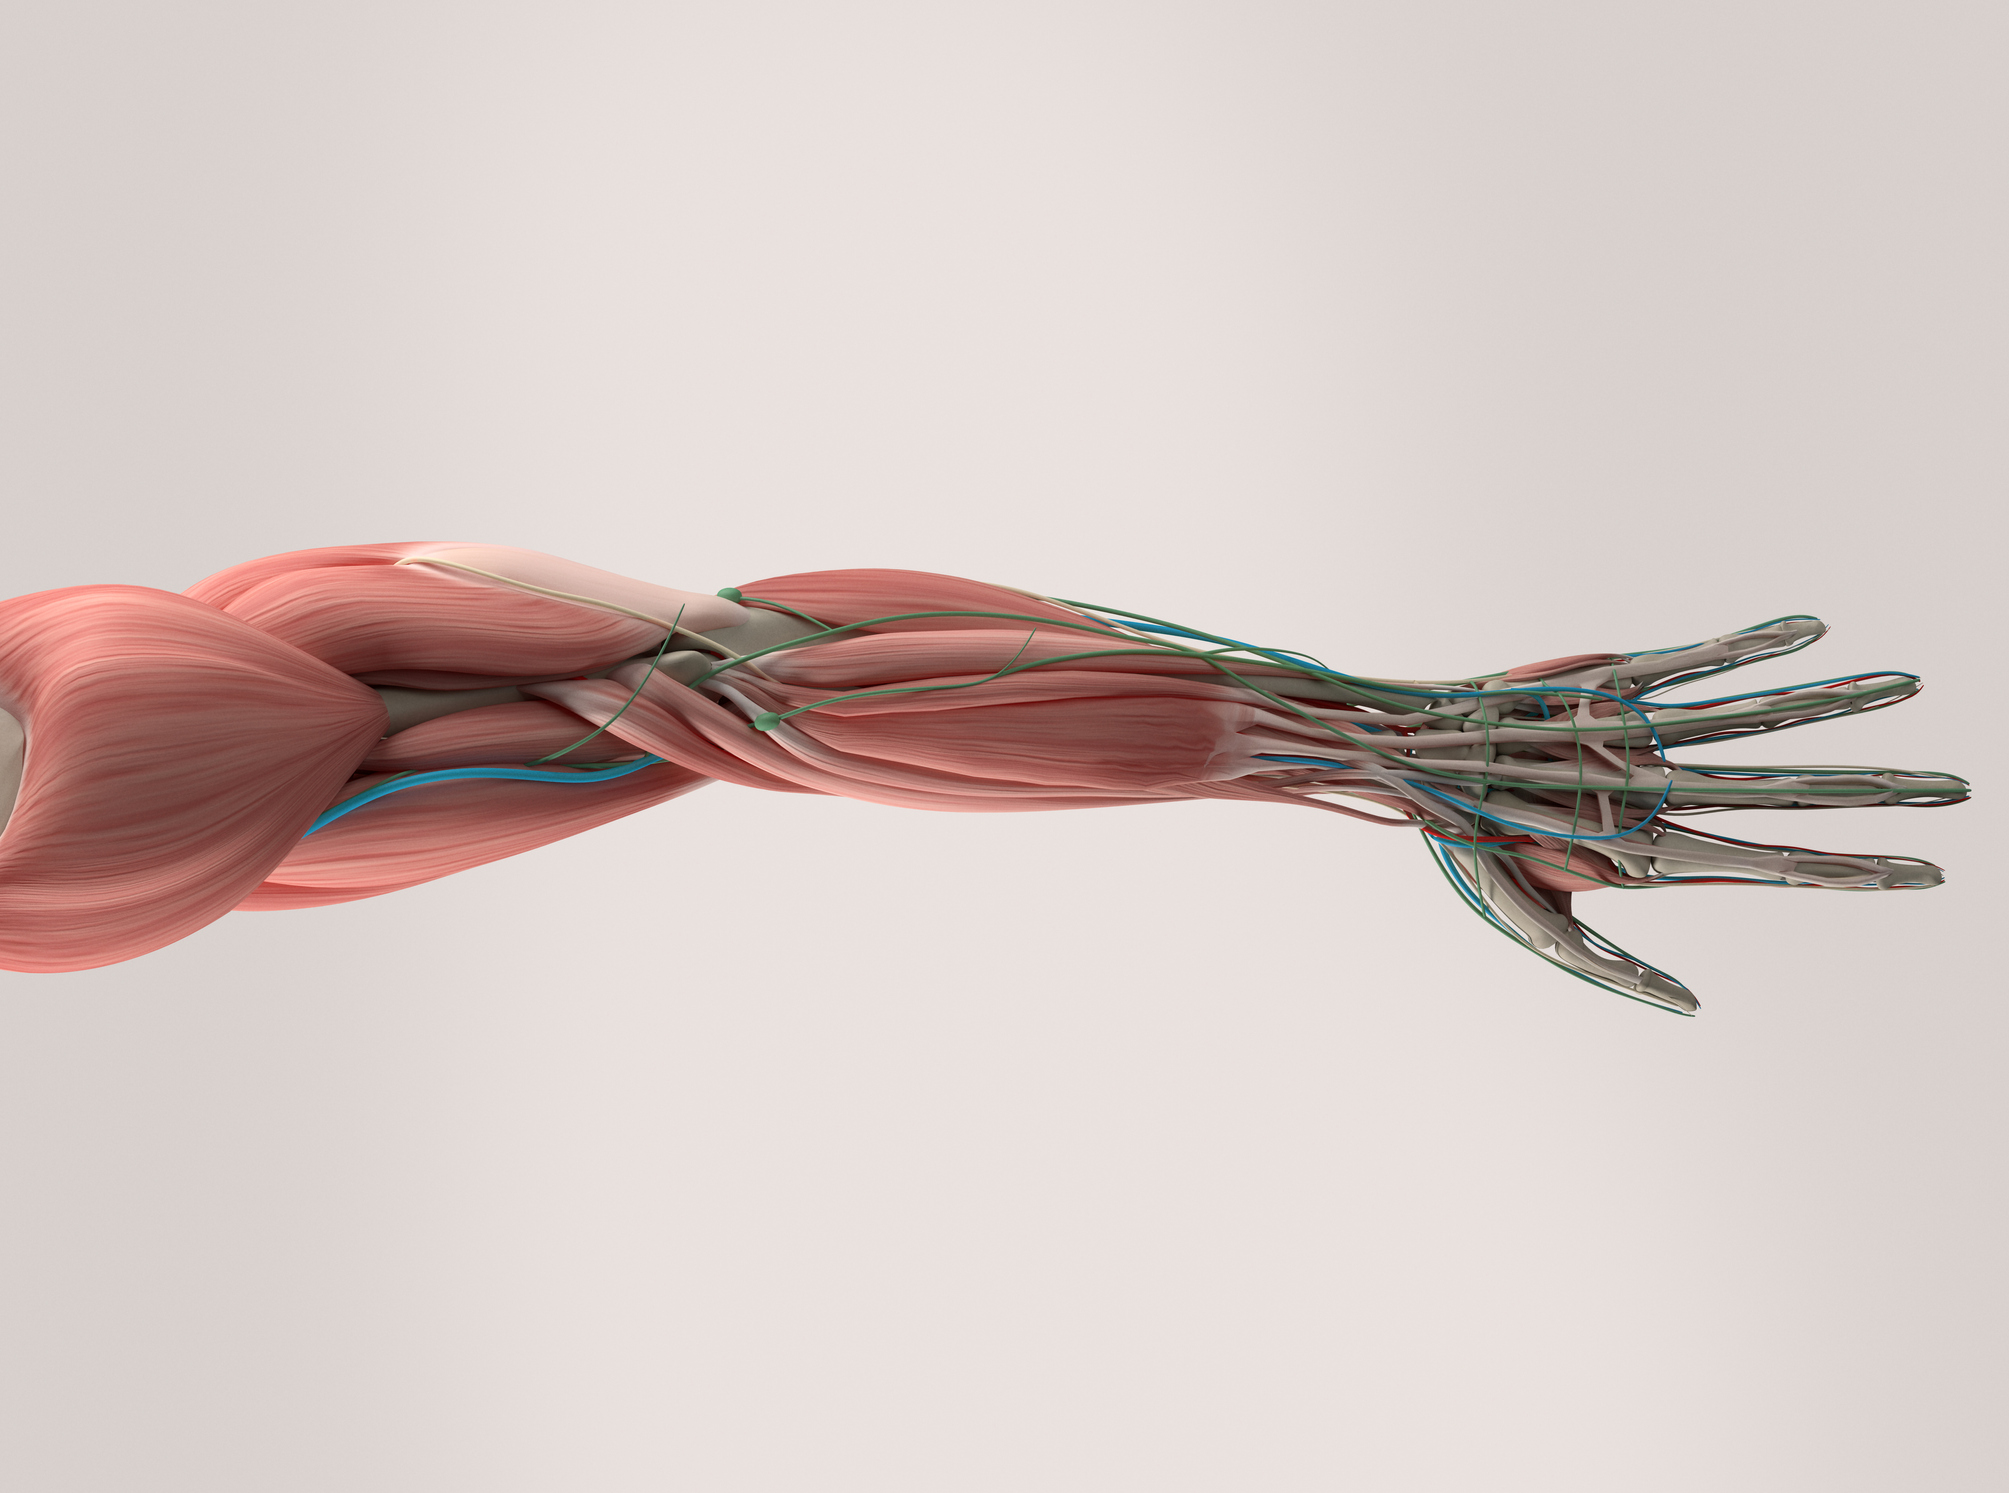 Human anatomy, hand, arm,muscular system on plain studio background.